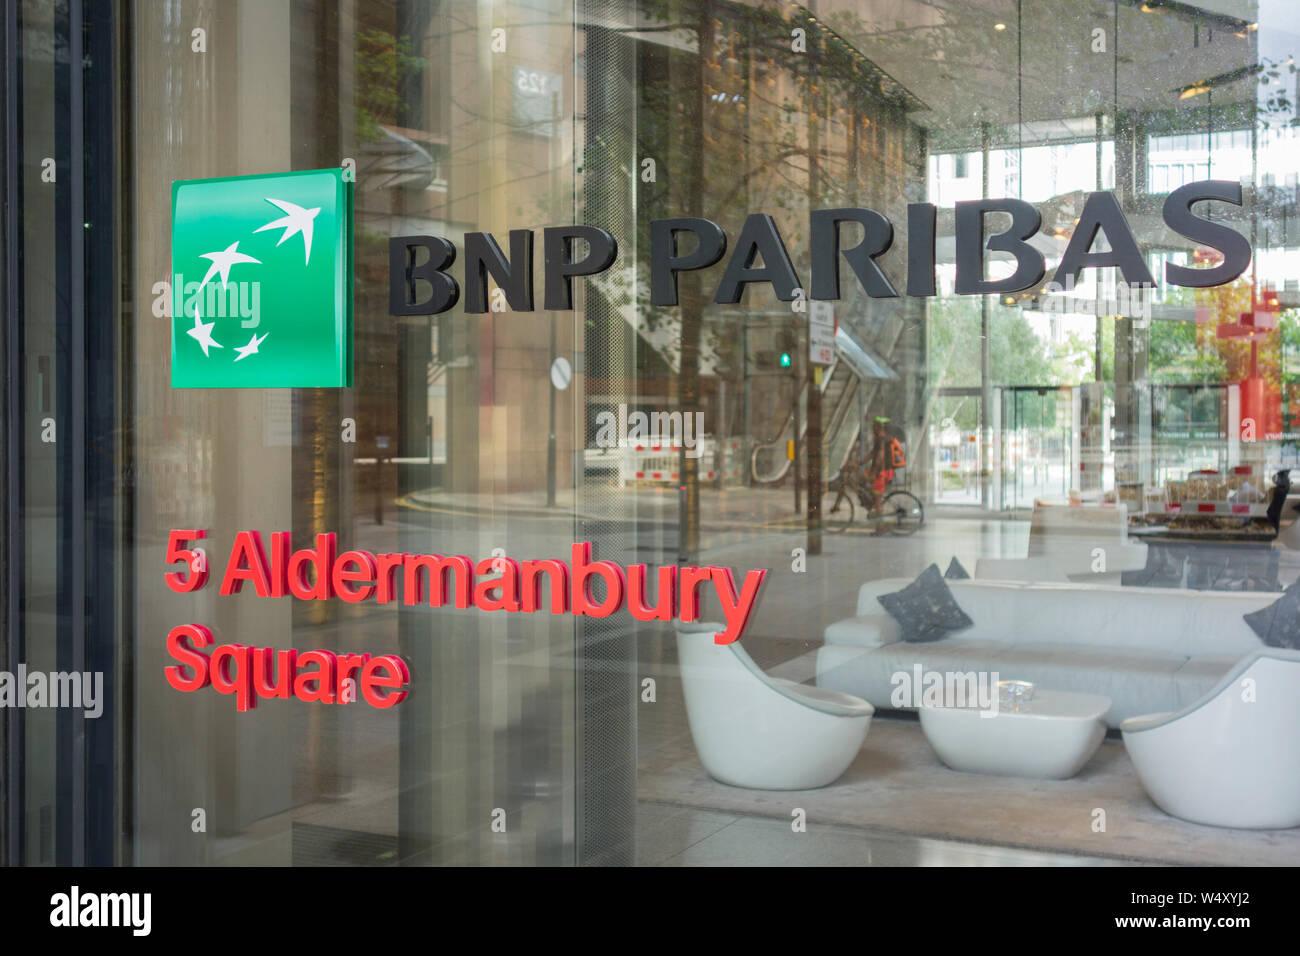 BNP Paribas, 5 Aldermanbury Square, Barbican, London, EC2, UK Stock Photo